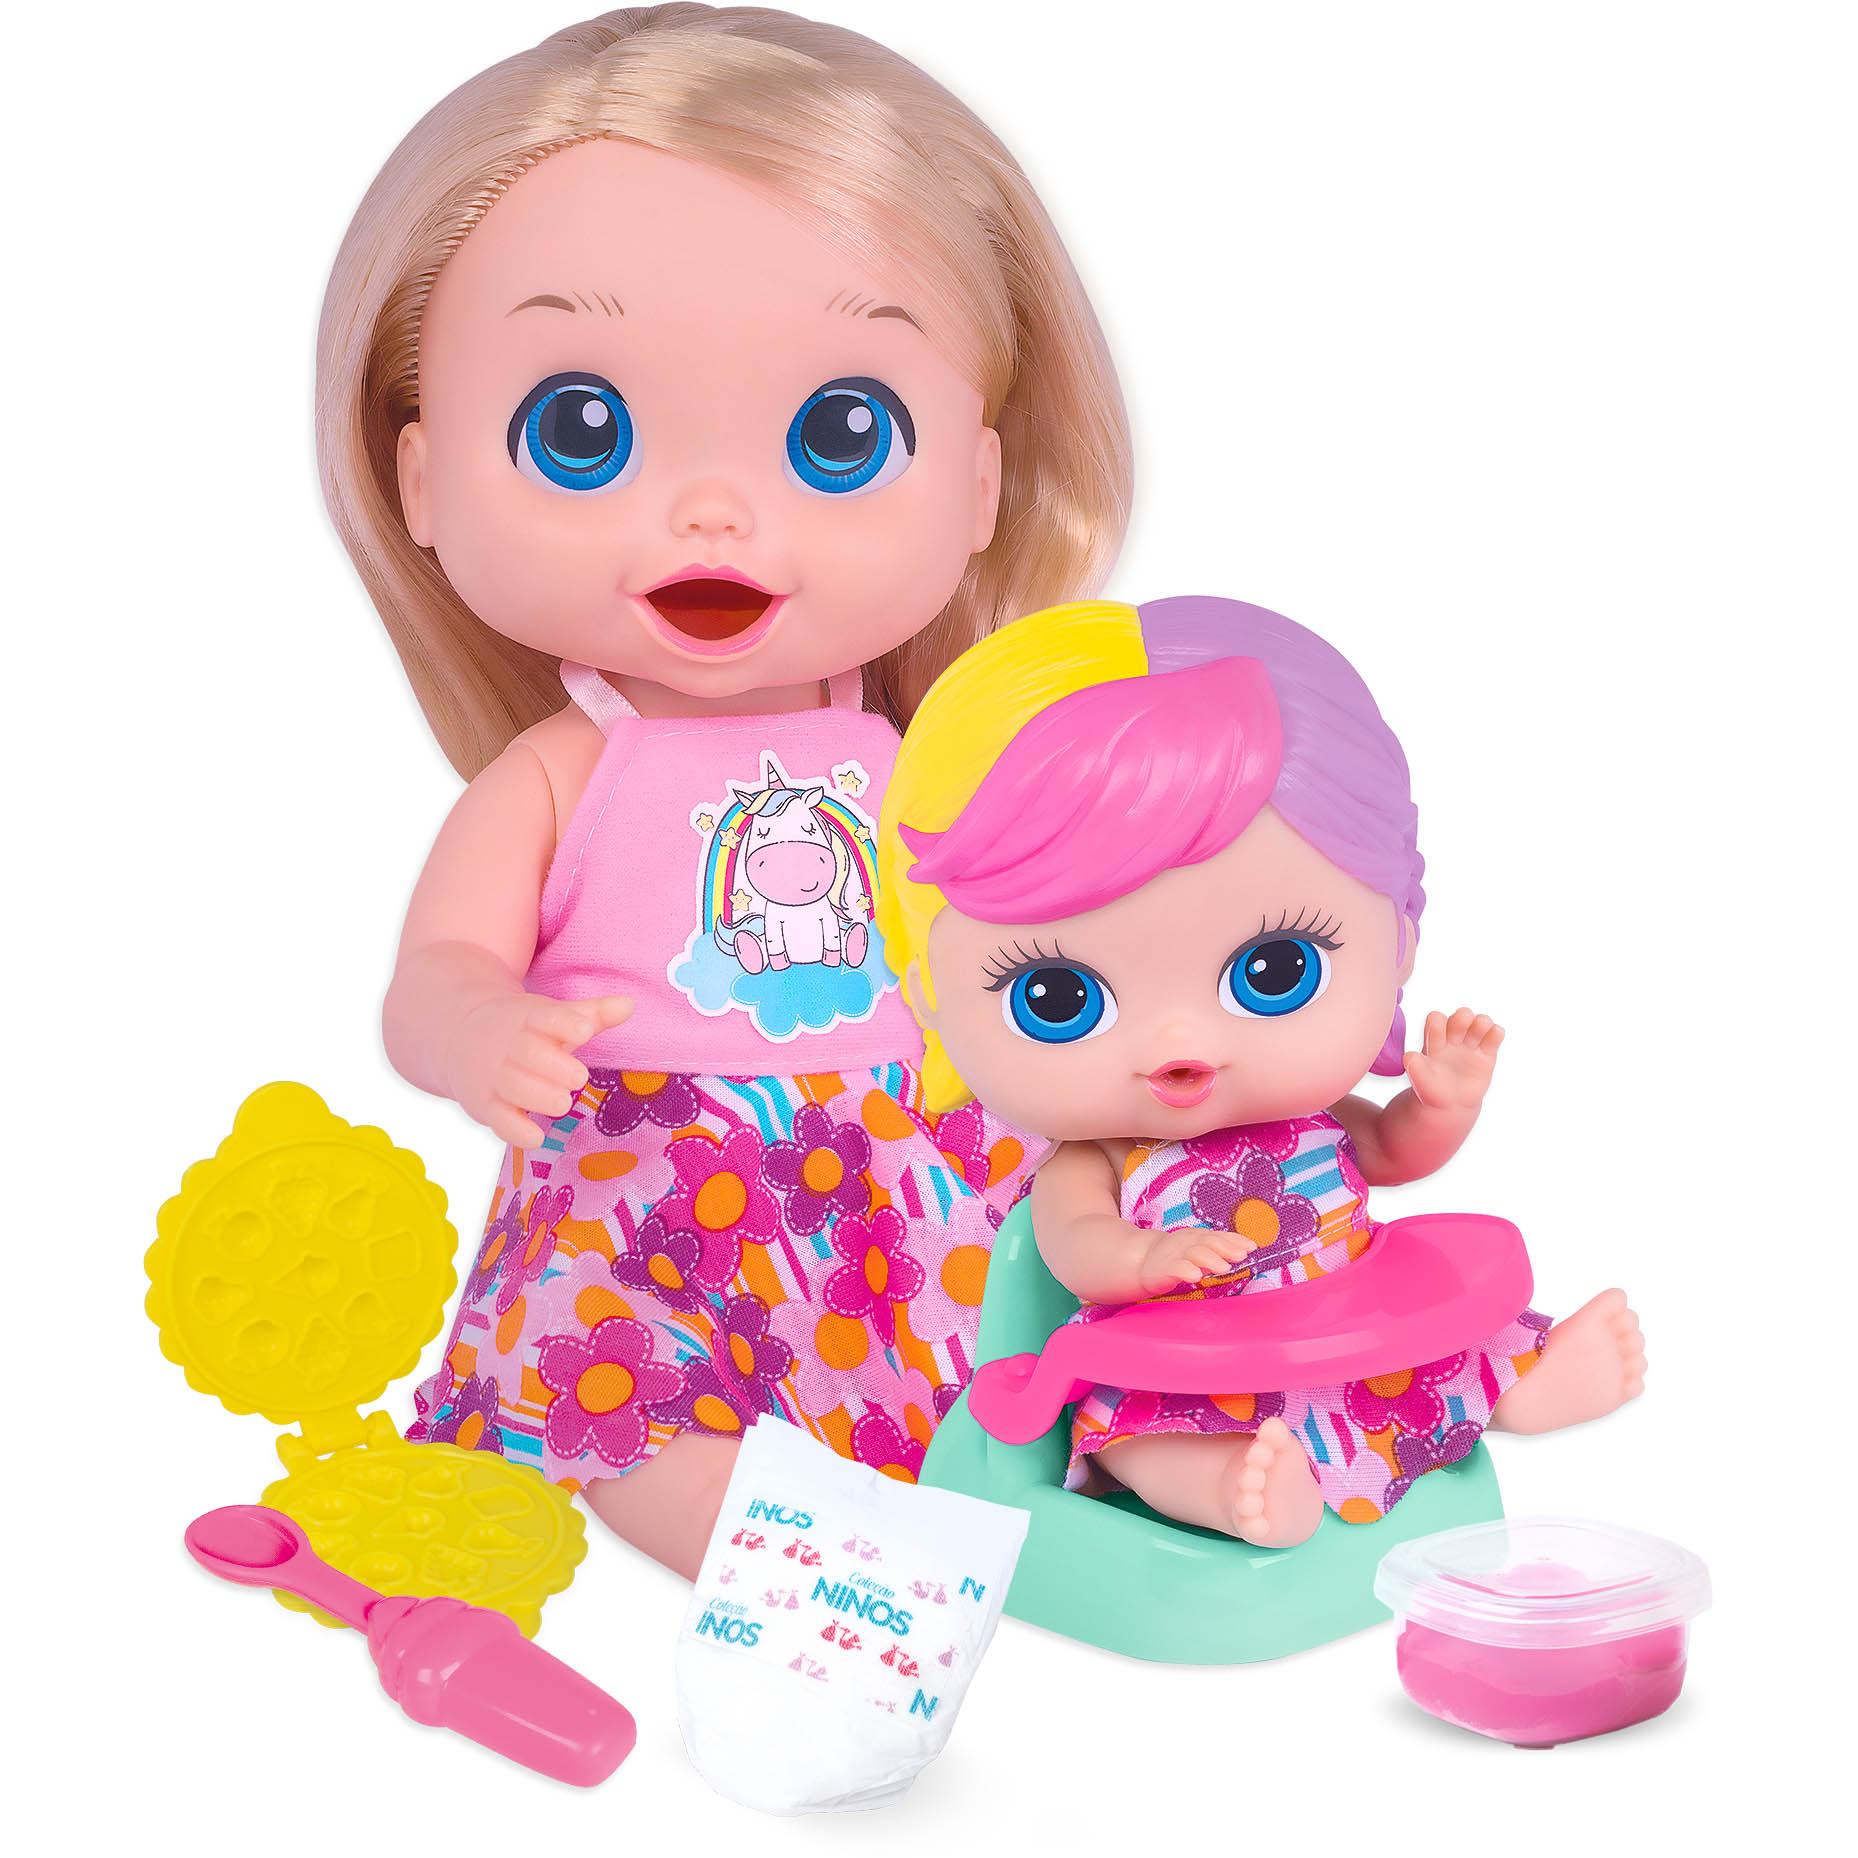 Boneca - Baby's Collection - Papinha Sapeca - Super Toys